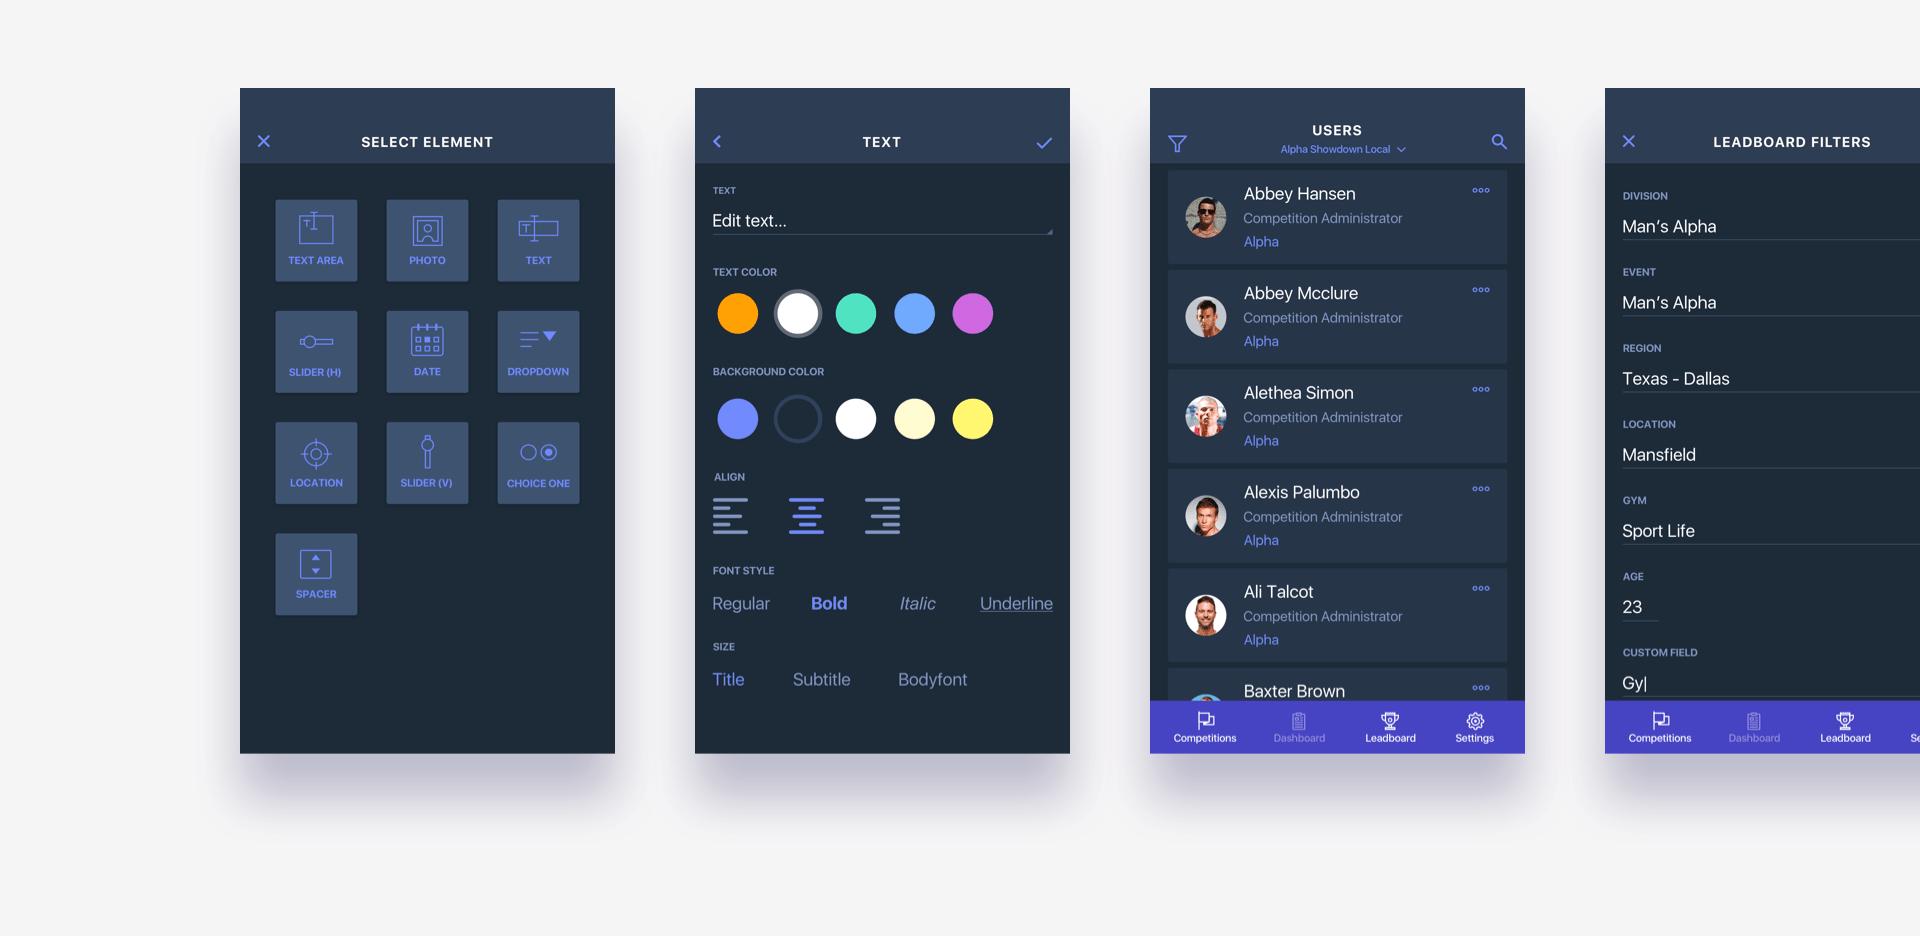 crossfit_mobile_2